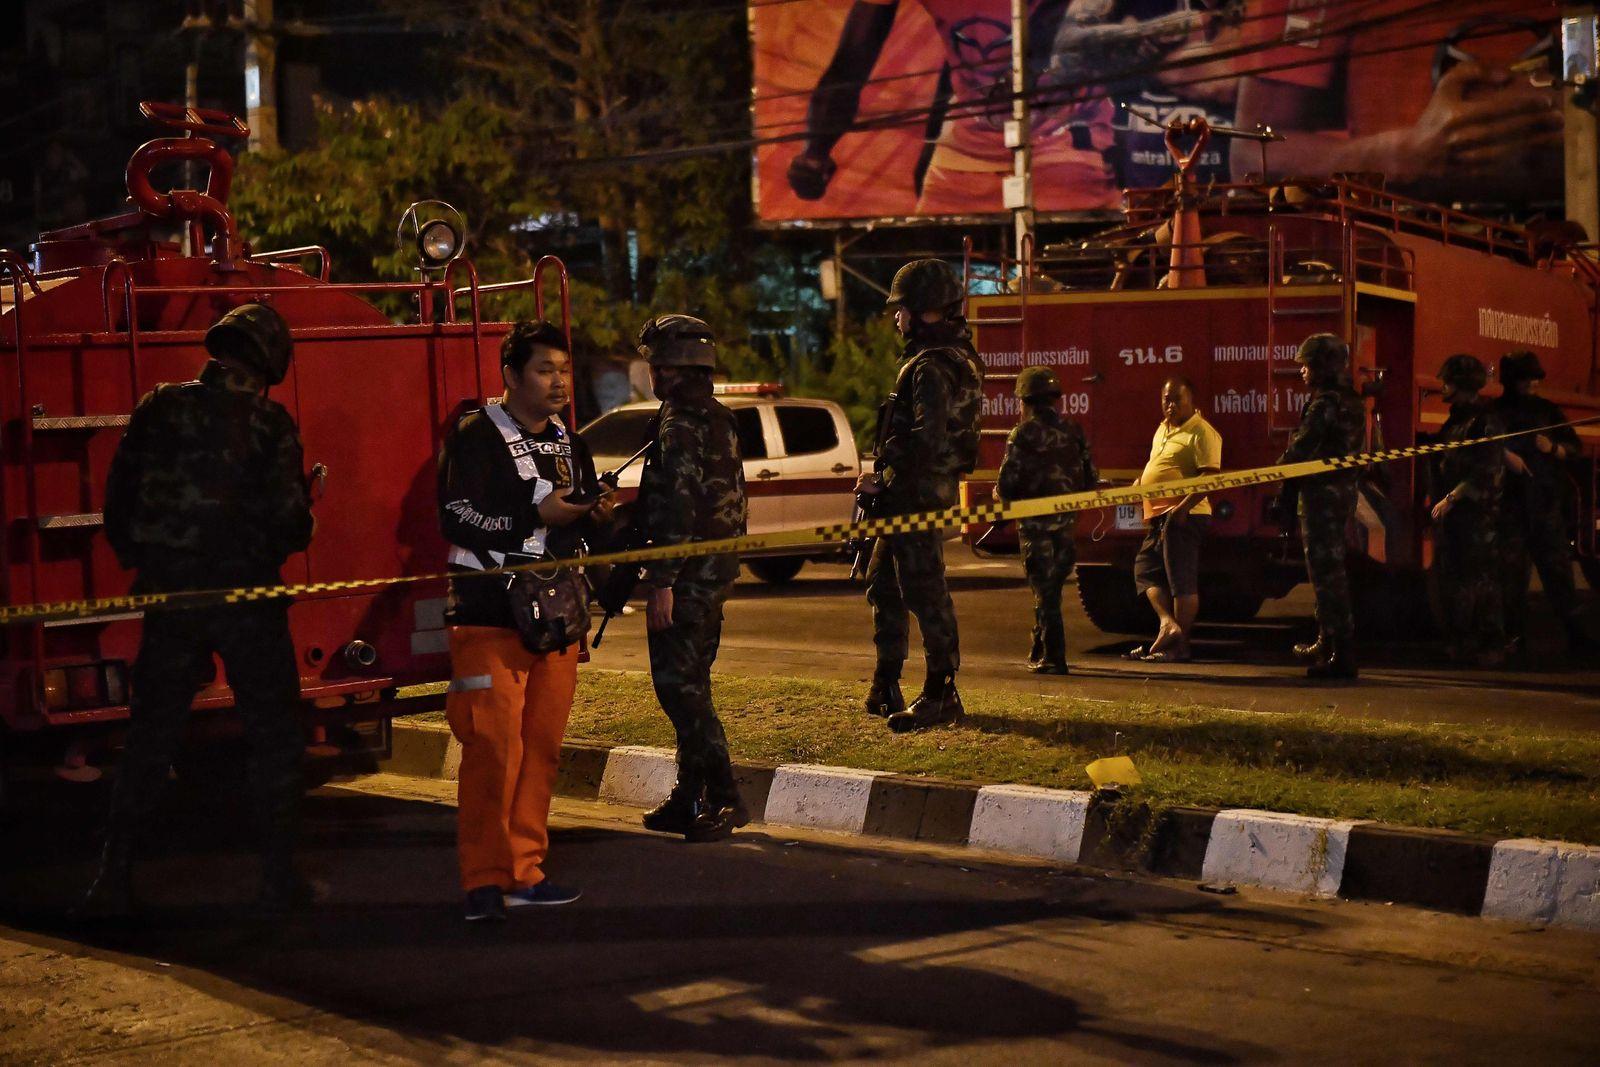 THAILAND-CRIME-SHOOTING